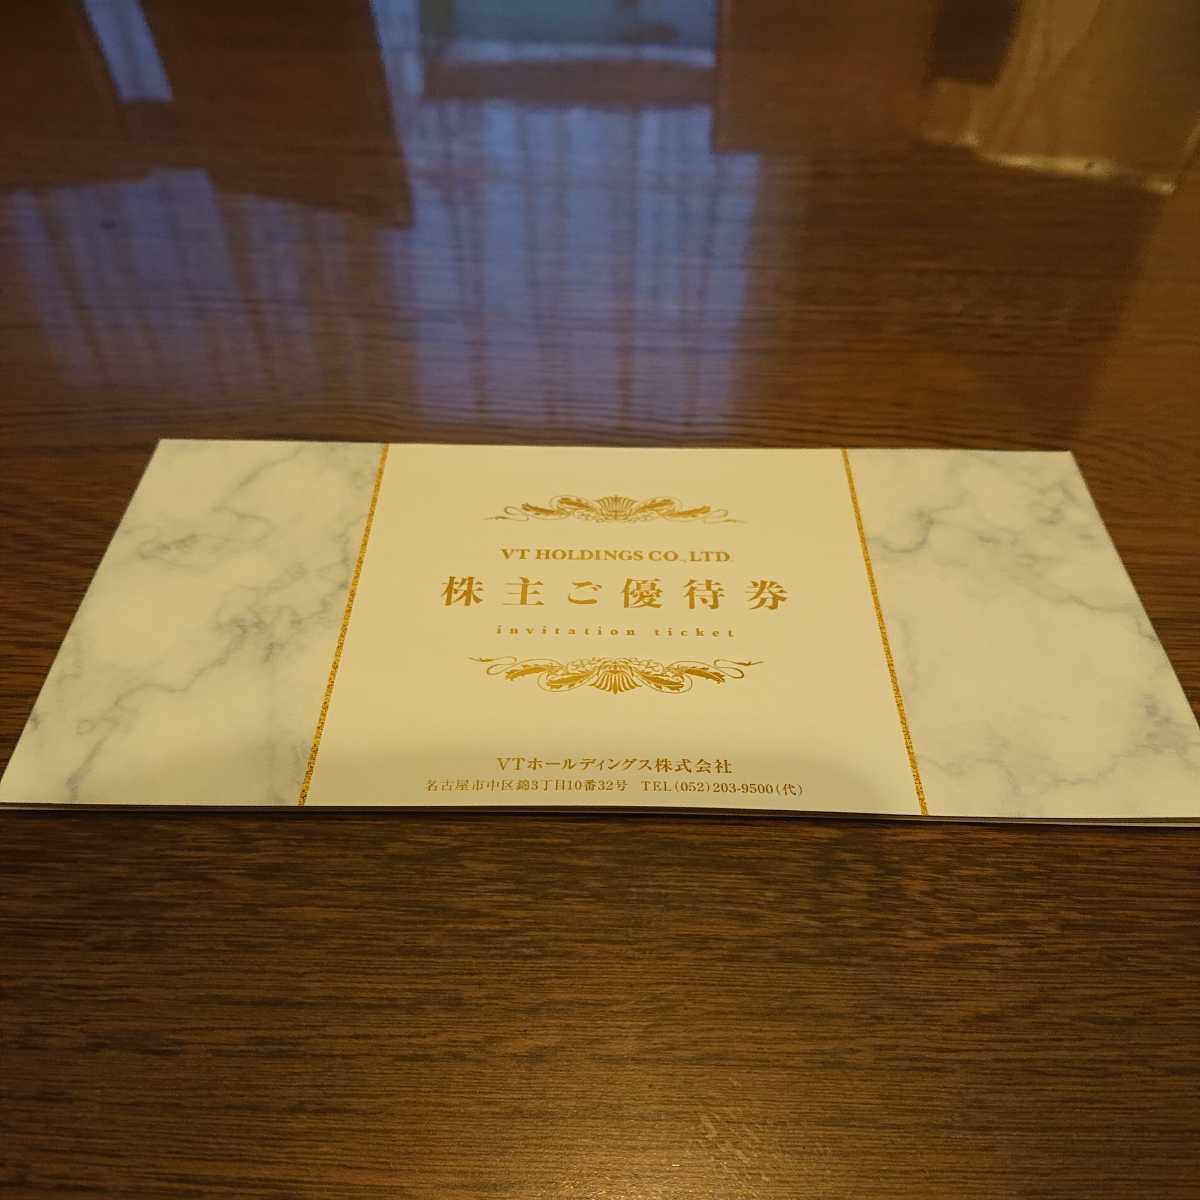 VTホールディングス株主優待 KeePer LABO20%割引券など (1冊:未使用)_画像1